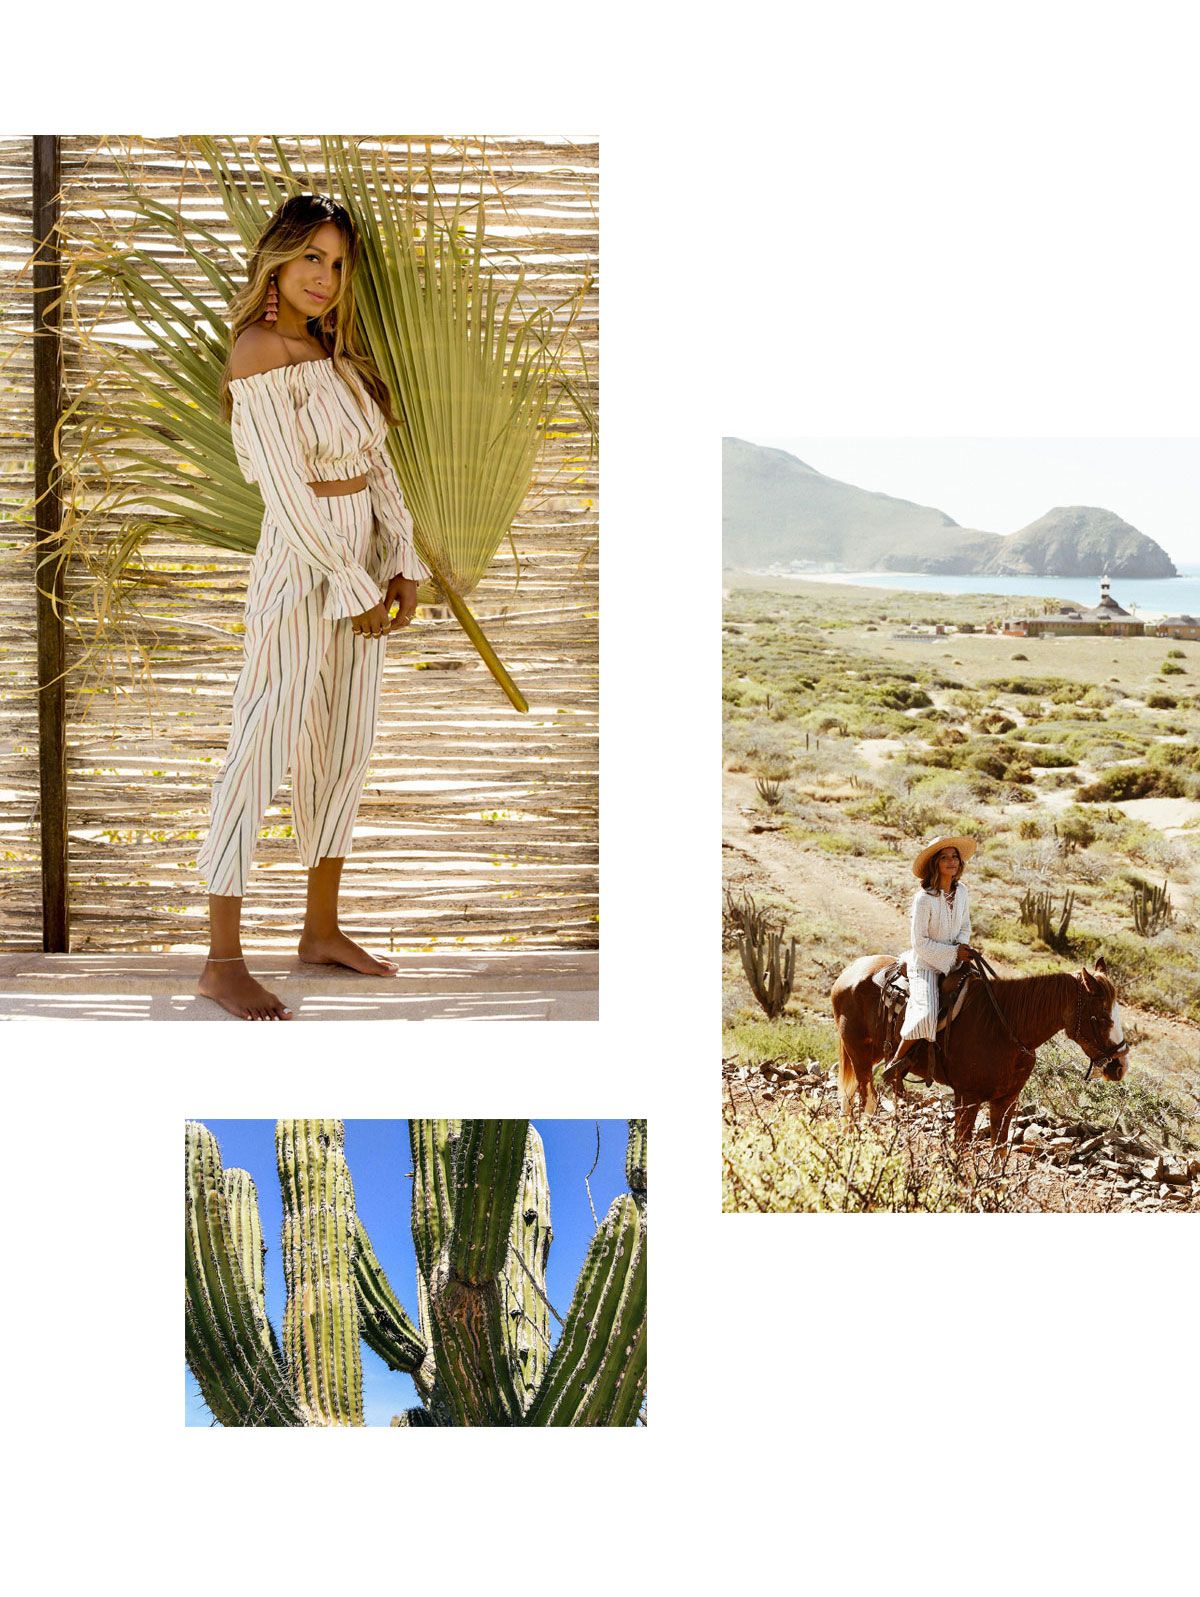 billabong women,billabong women's europe,sincerely jules,blogueuse,collab,mode,fashion,beachwear,maillots de bains,mexique,shooting,